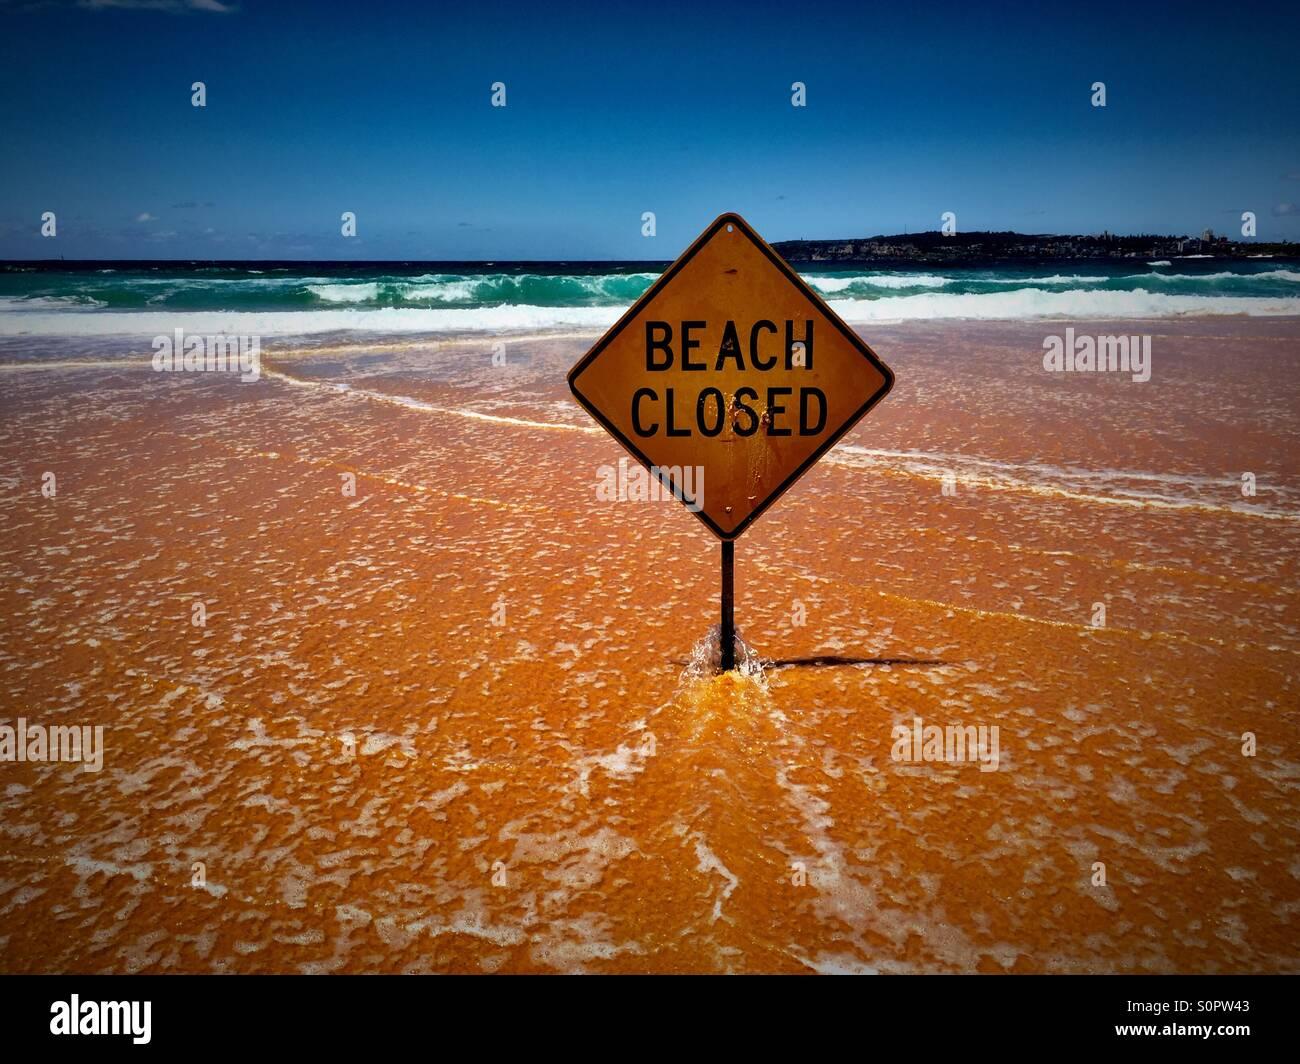 Beach closed! - Stock Image